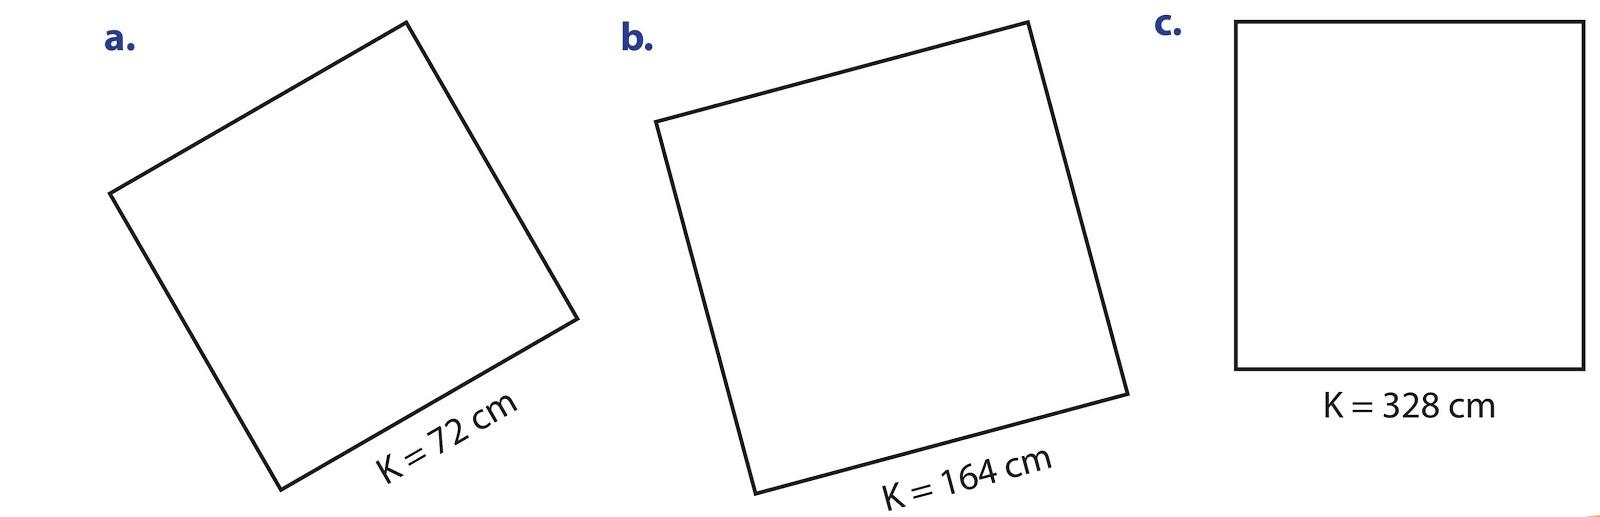 Materi Dan Kunci Jawaban Buku Siswa Senang Belajar Matematika Kelas 4 Sd Semester 2 Halaman 115 116 119 120 125 126 Lifanen